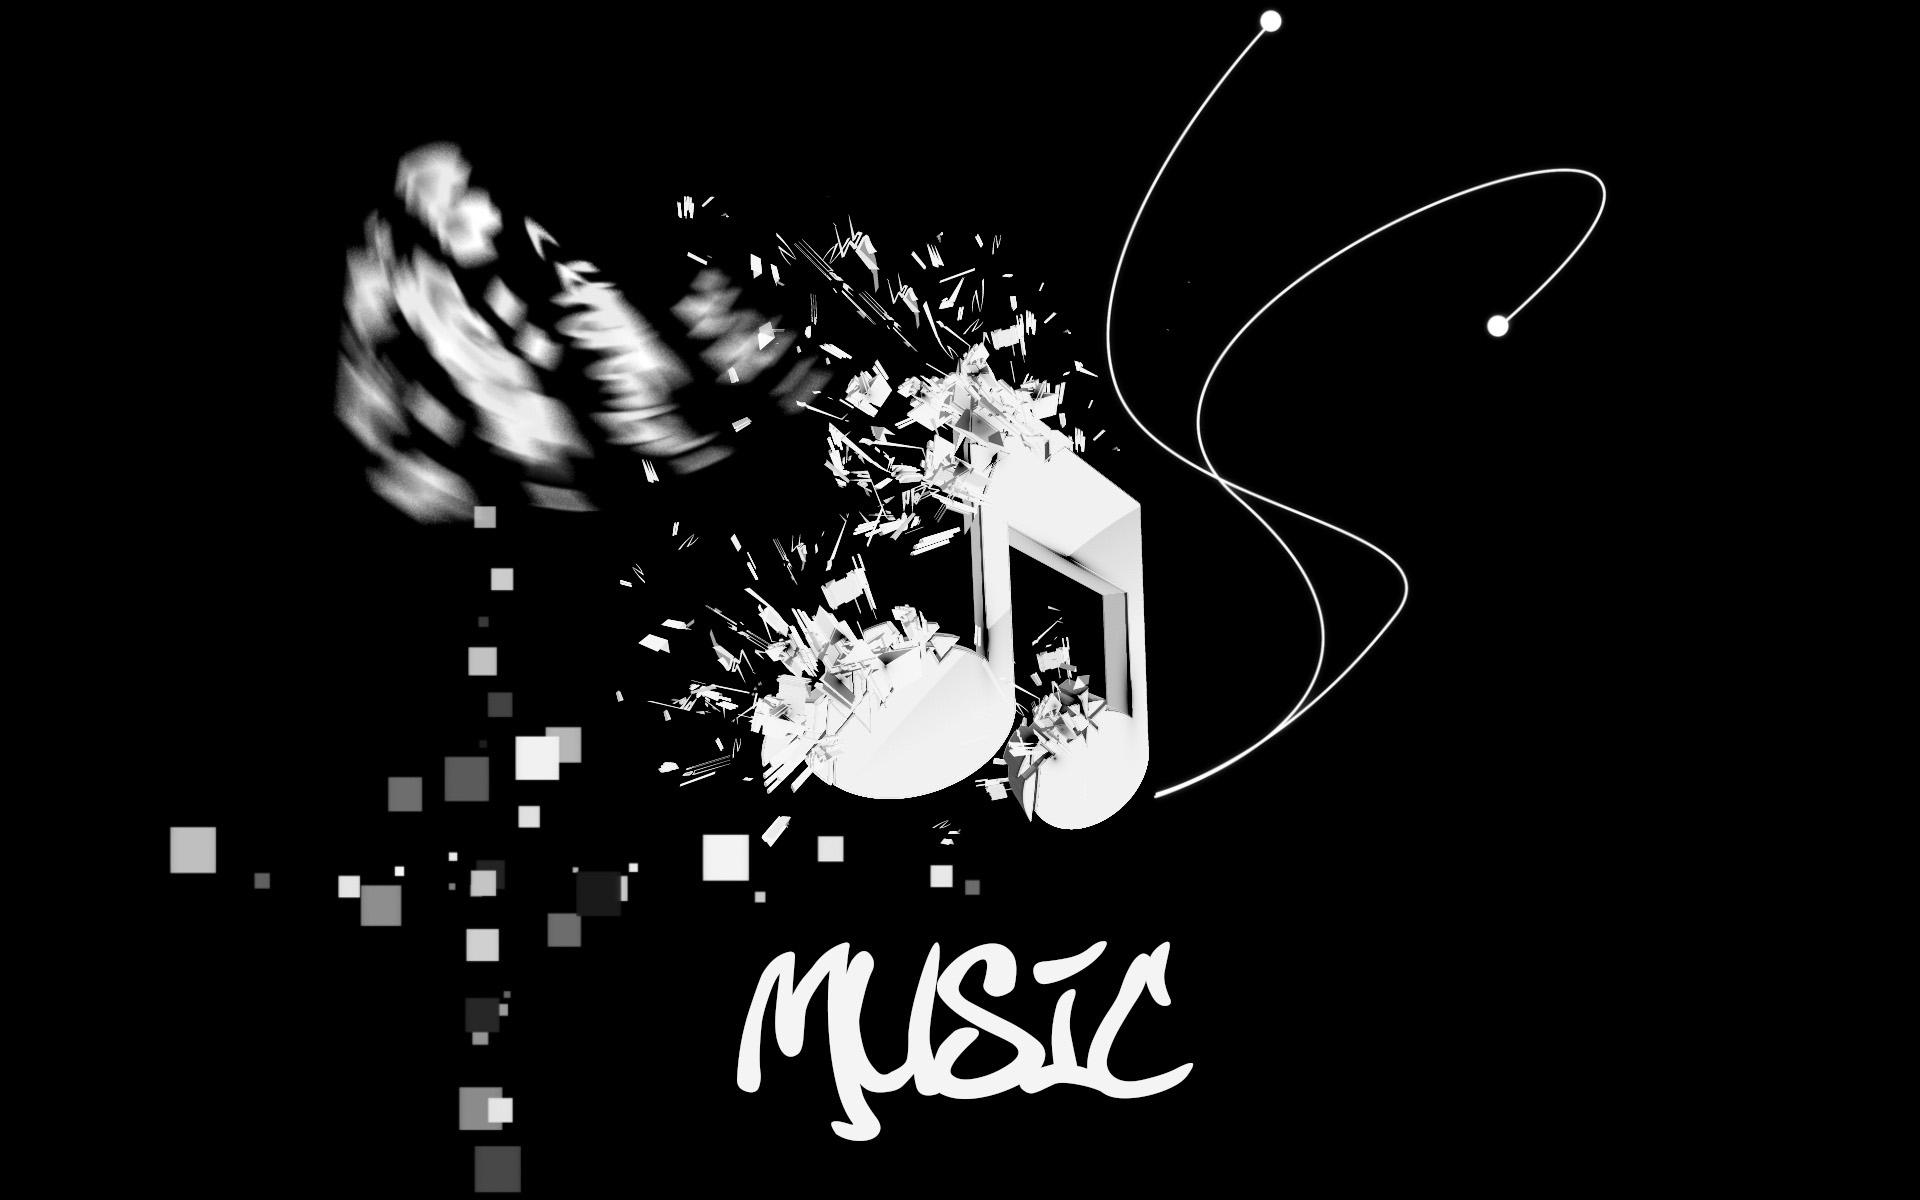 Anime Girls Headphones And Radio 1920x1080 Wallpaper Black Music Hd Wallpapers Pixelstalk Net